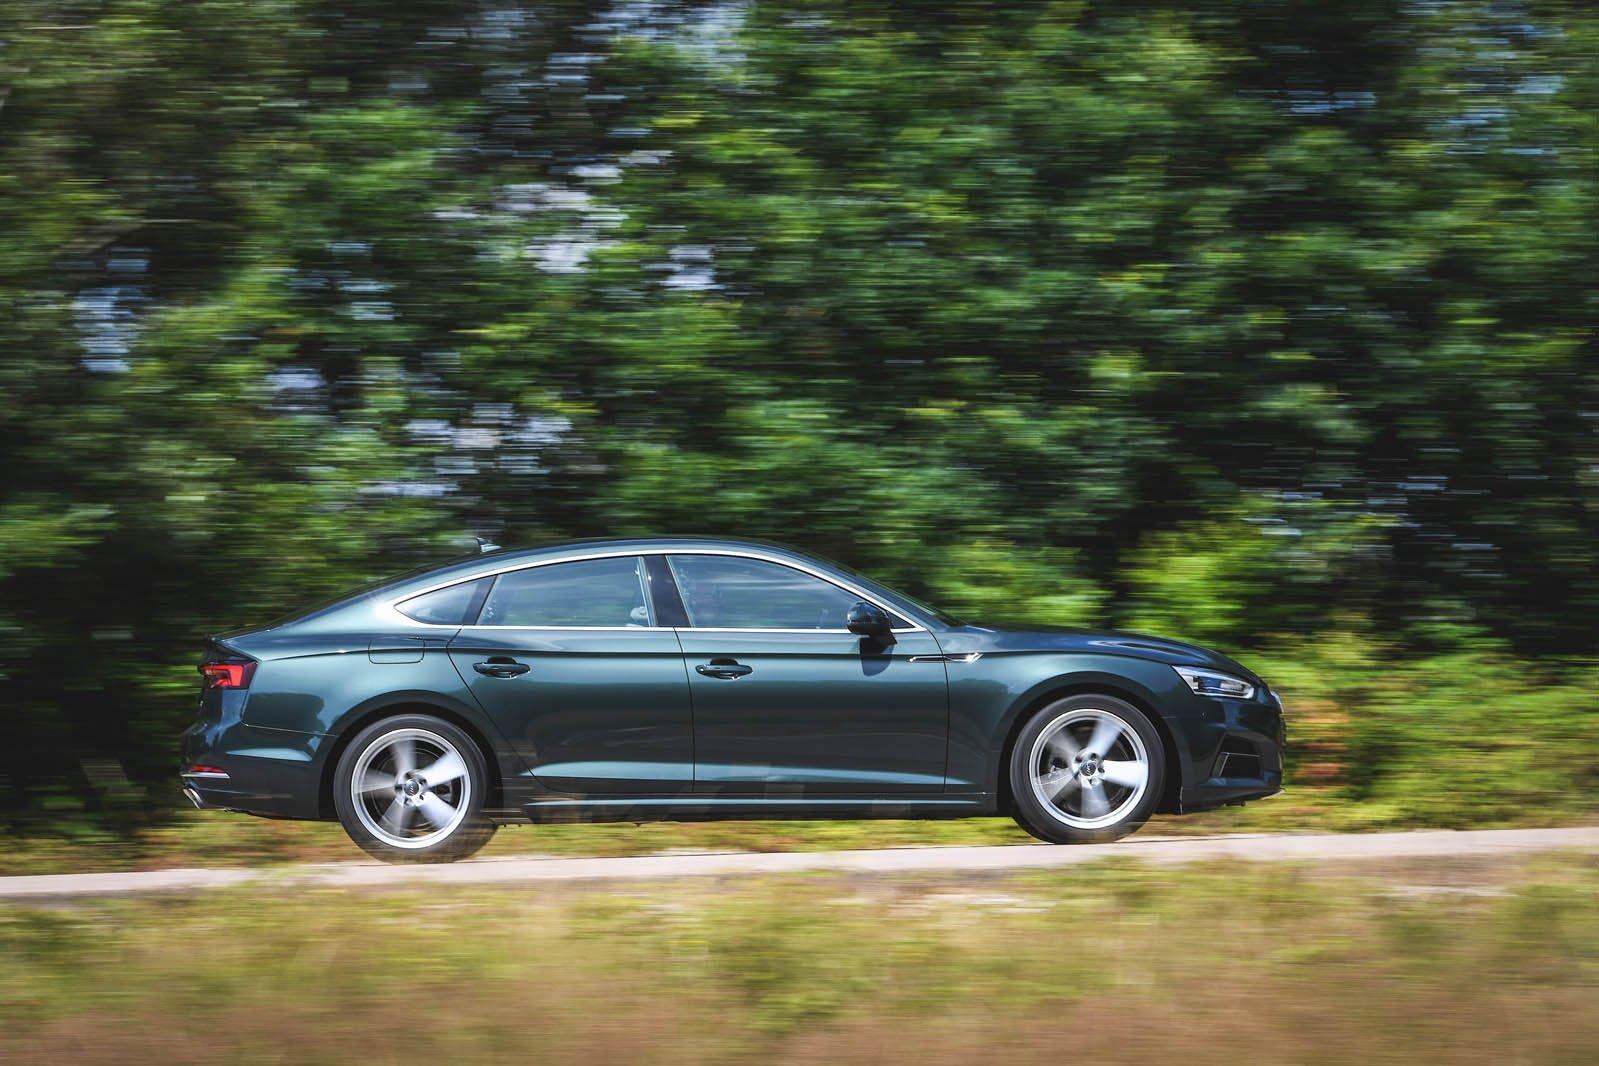 Audi A5 driving